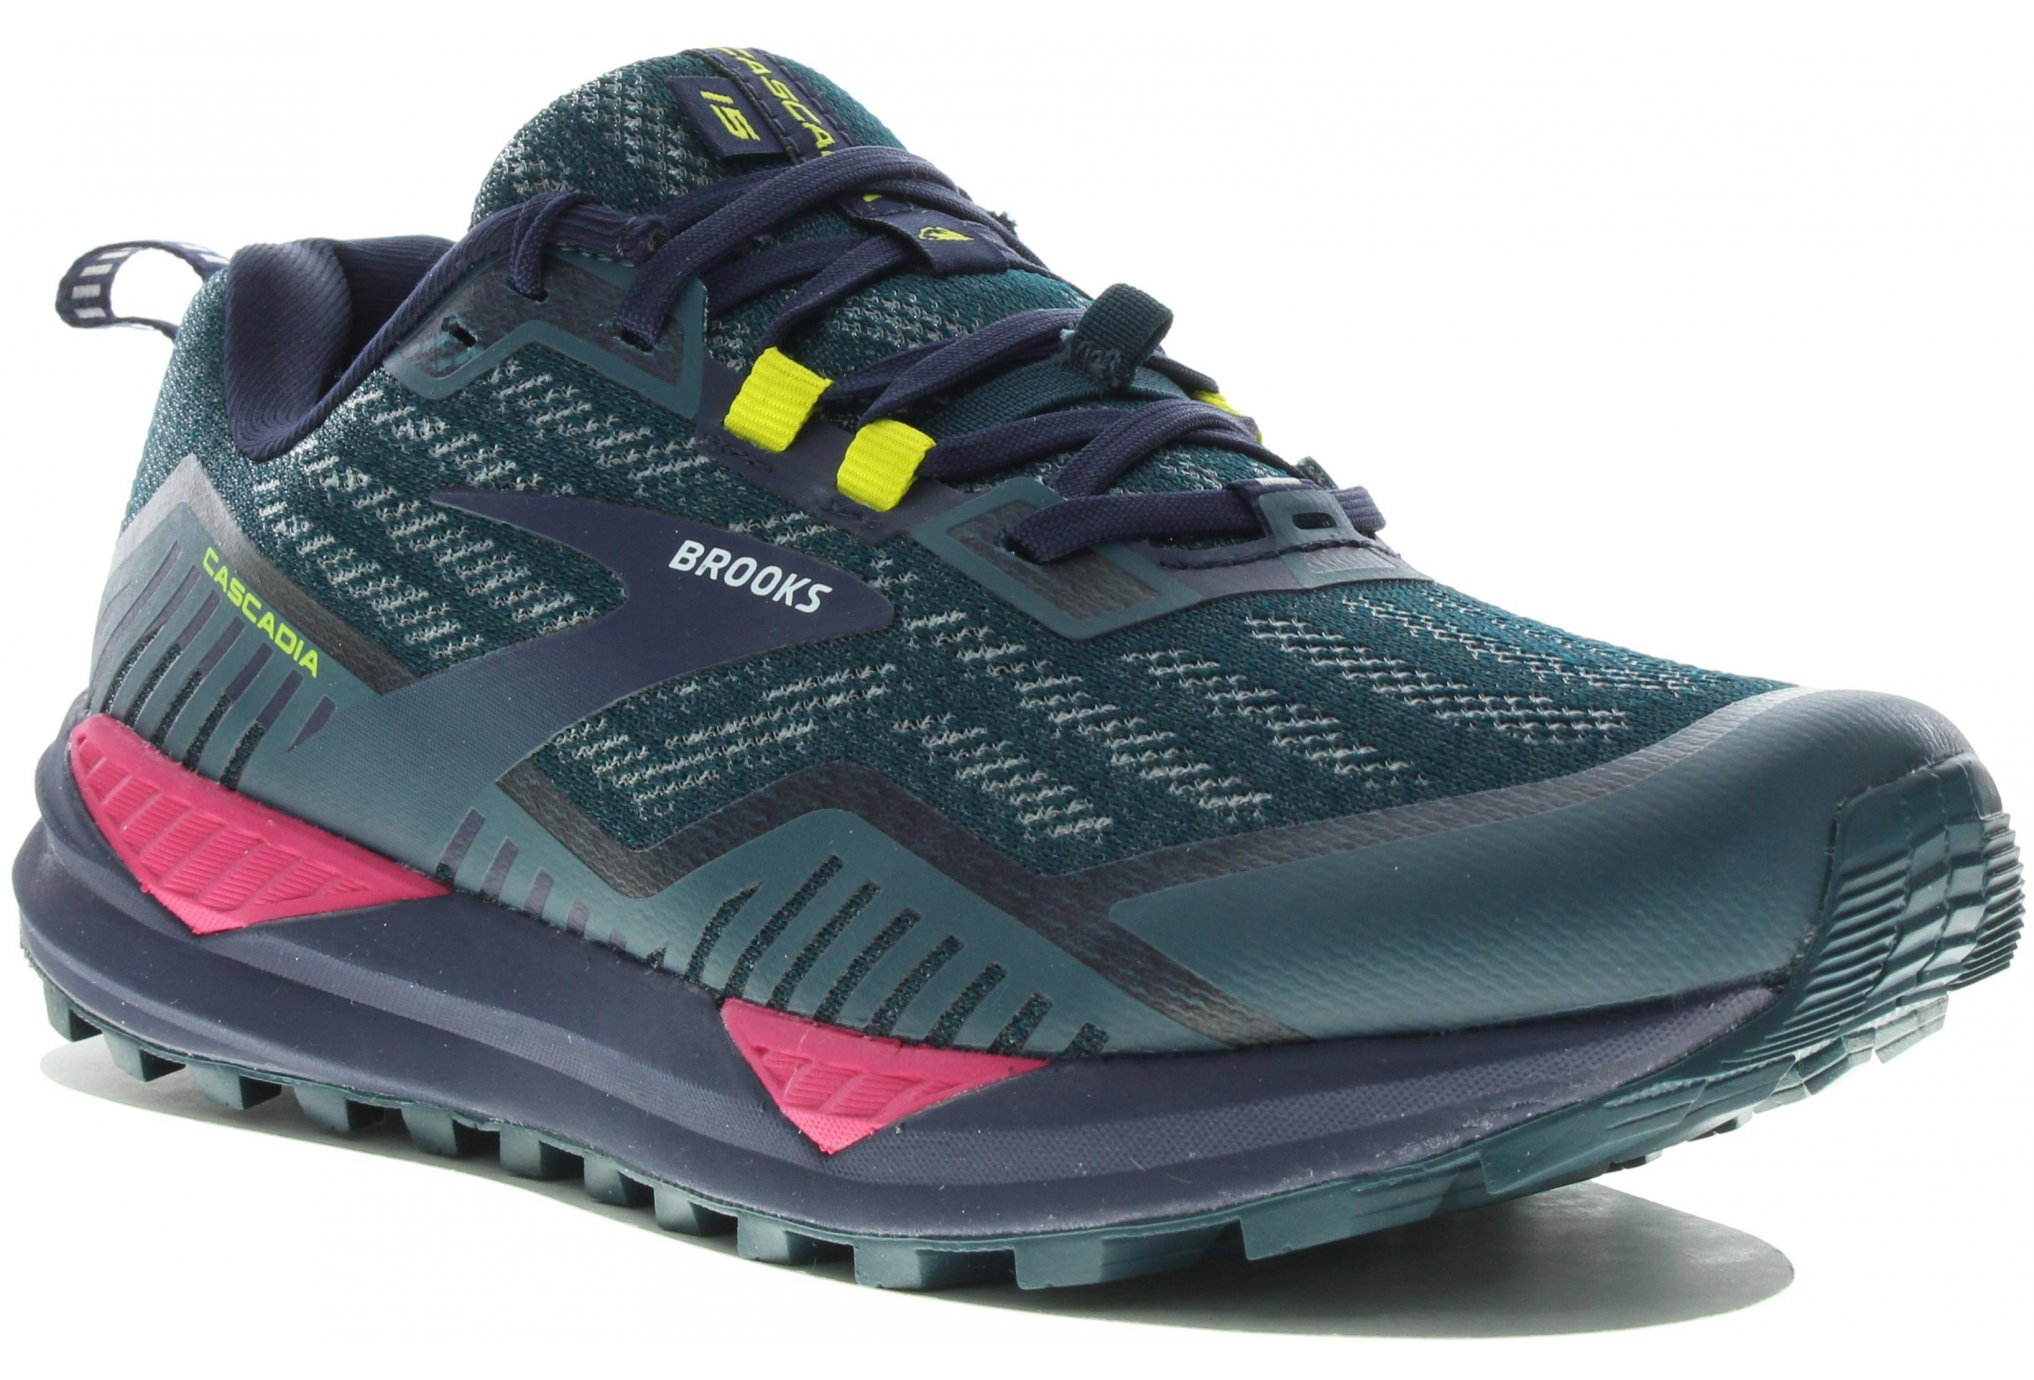 Brooks Cascadia 15 W Chaussures running femme